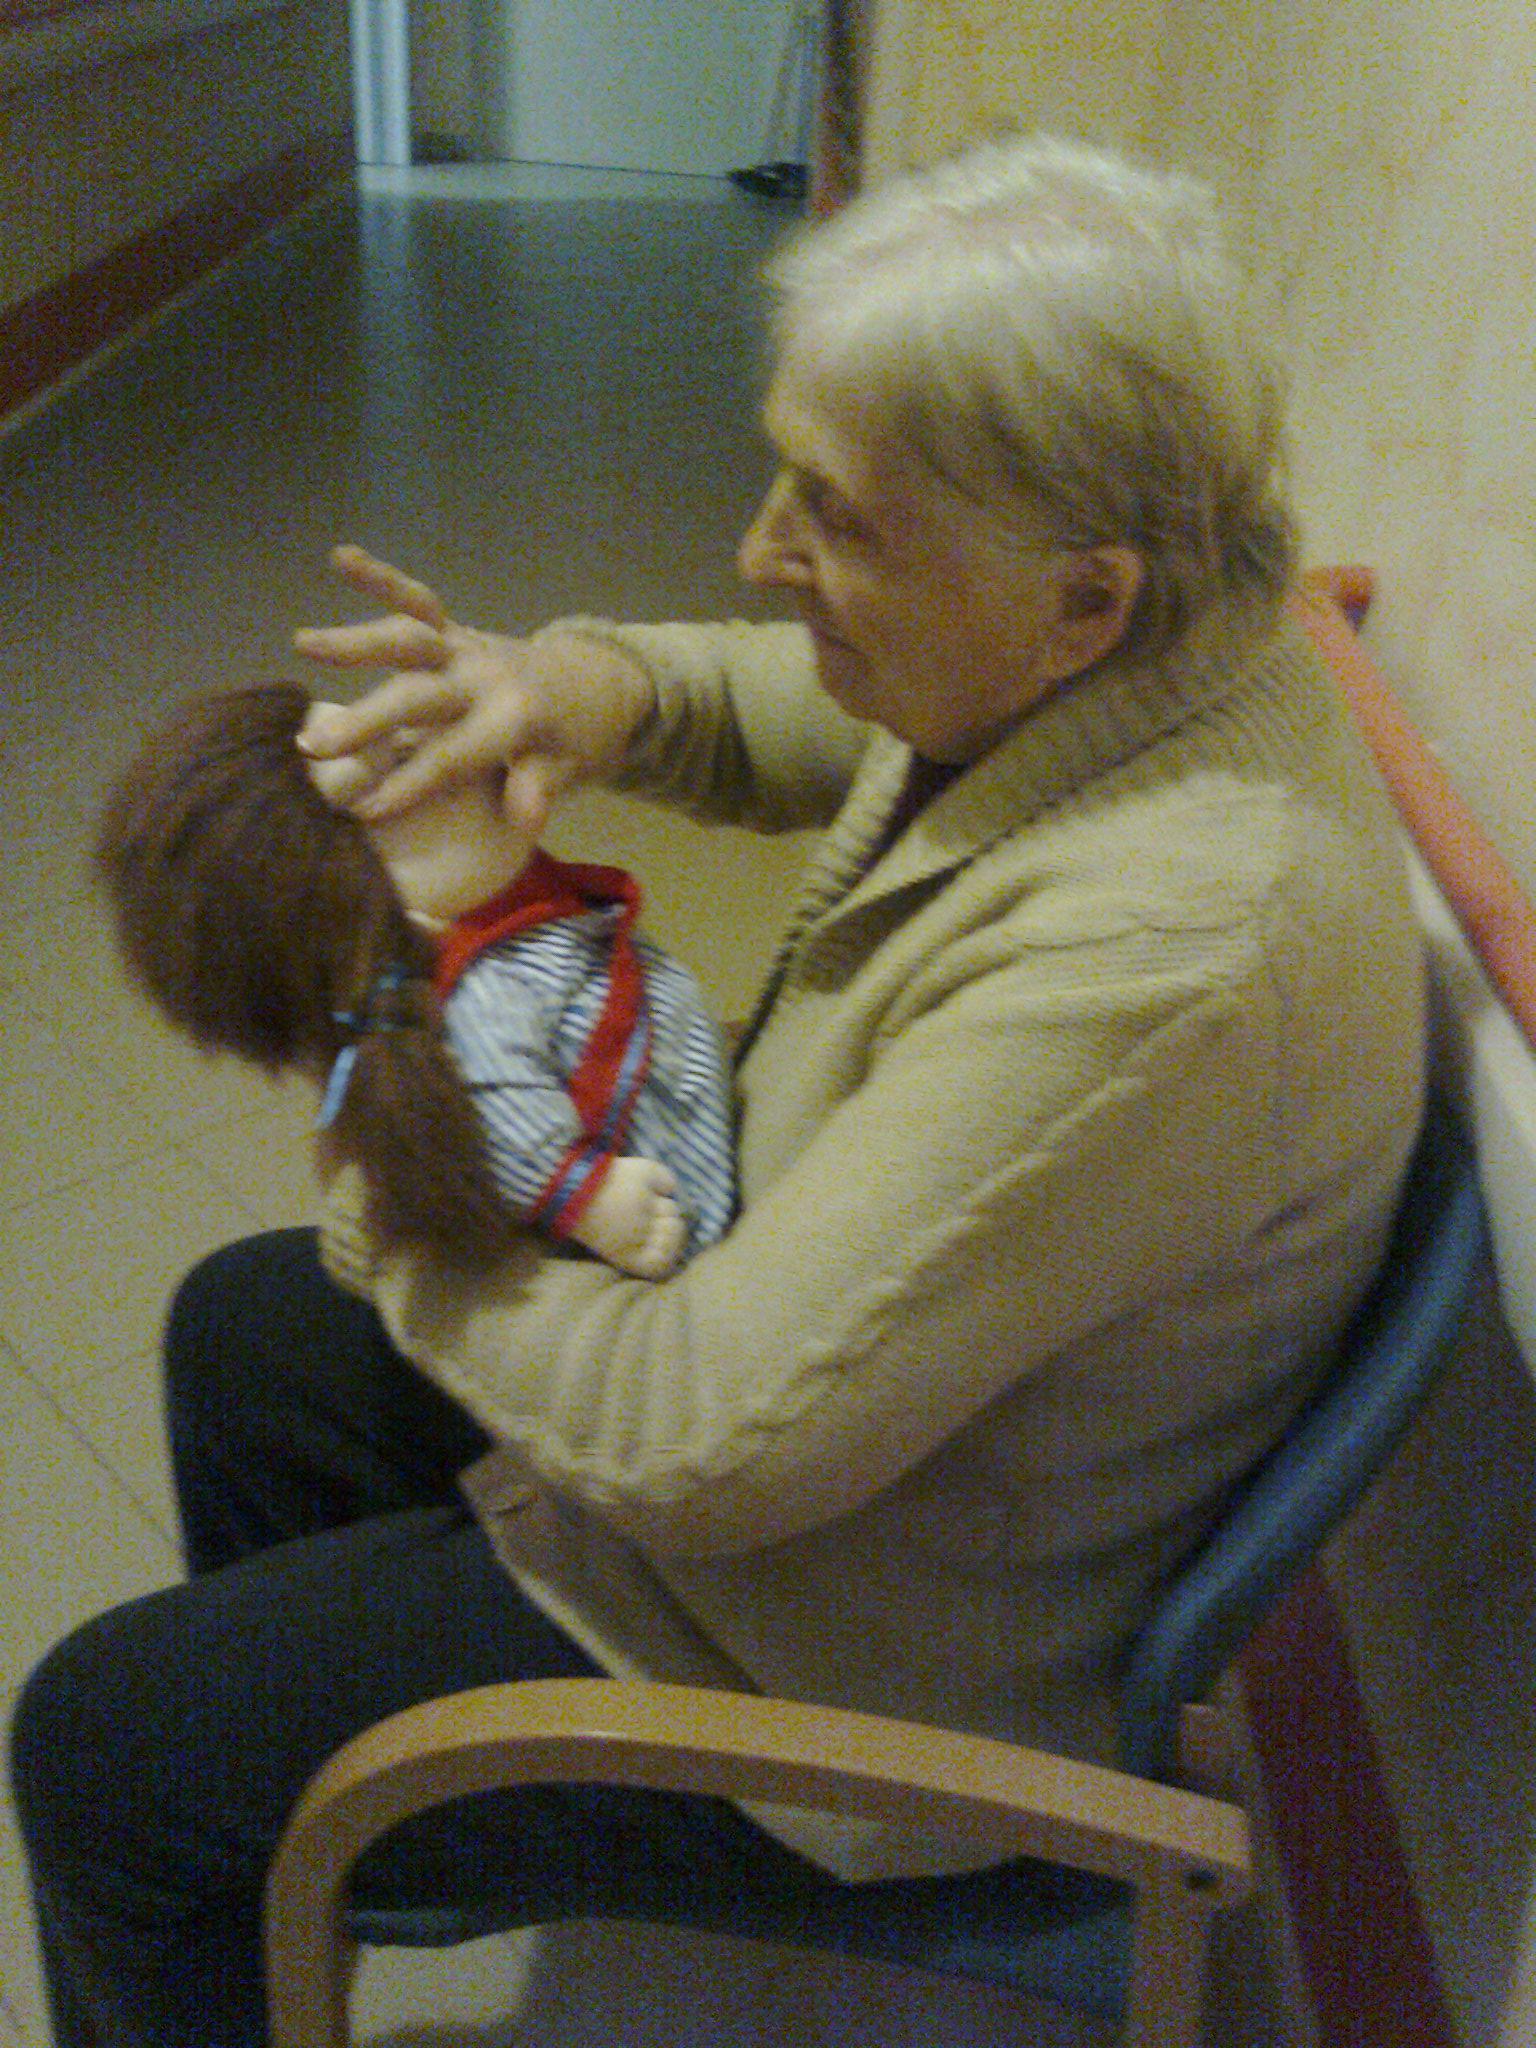 Dott.ssa Roberta Marangoni - Psicologa Psicoterapeuta - Doll Therapy